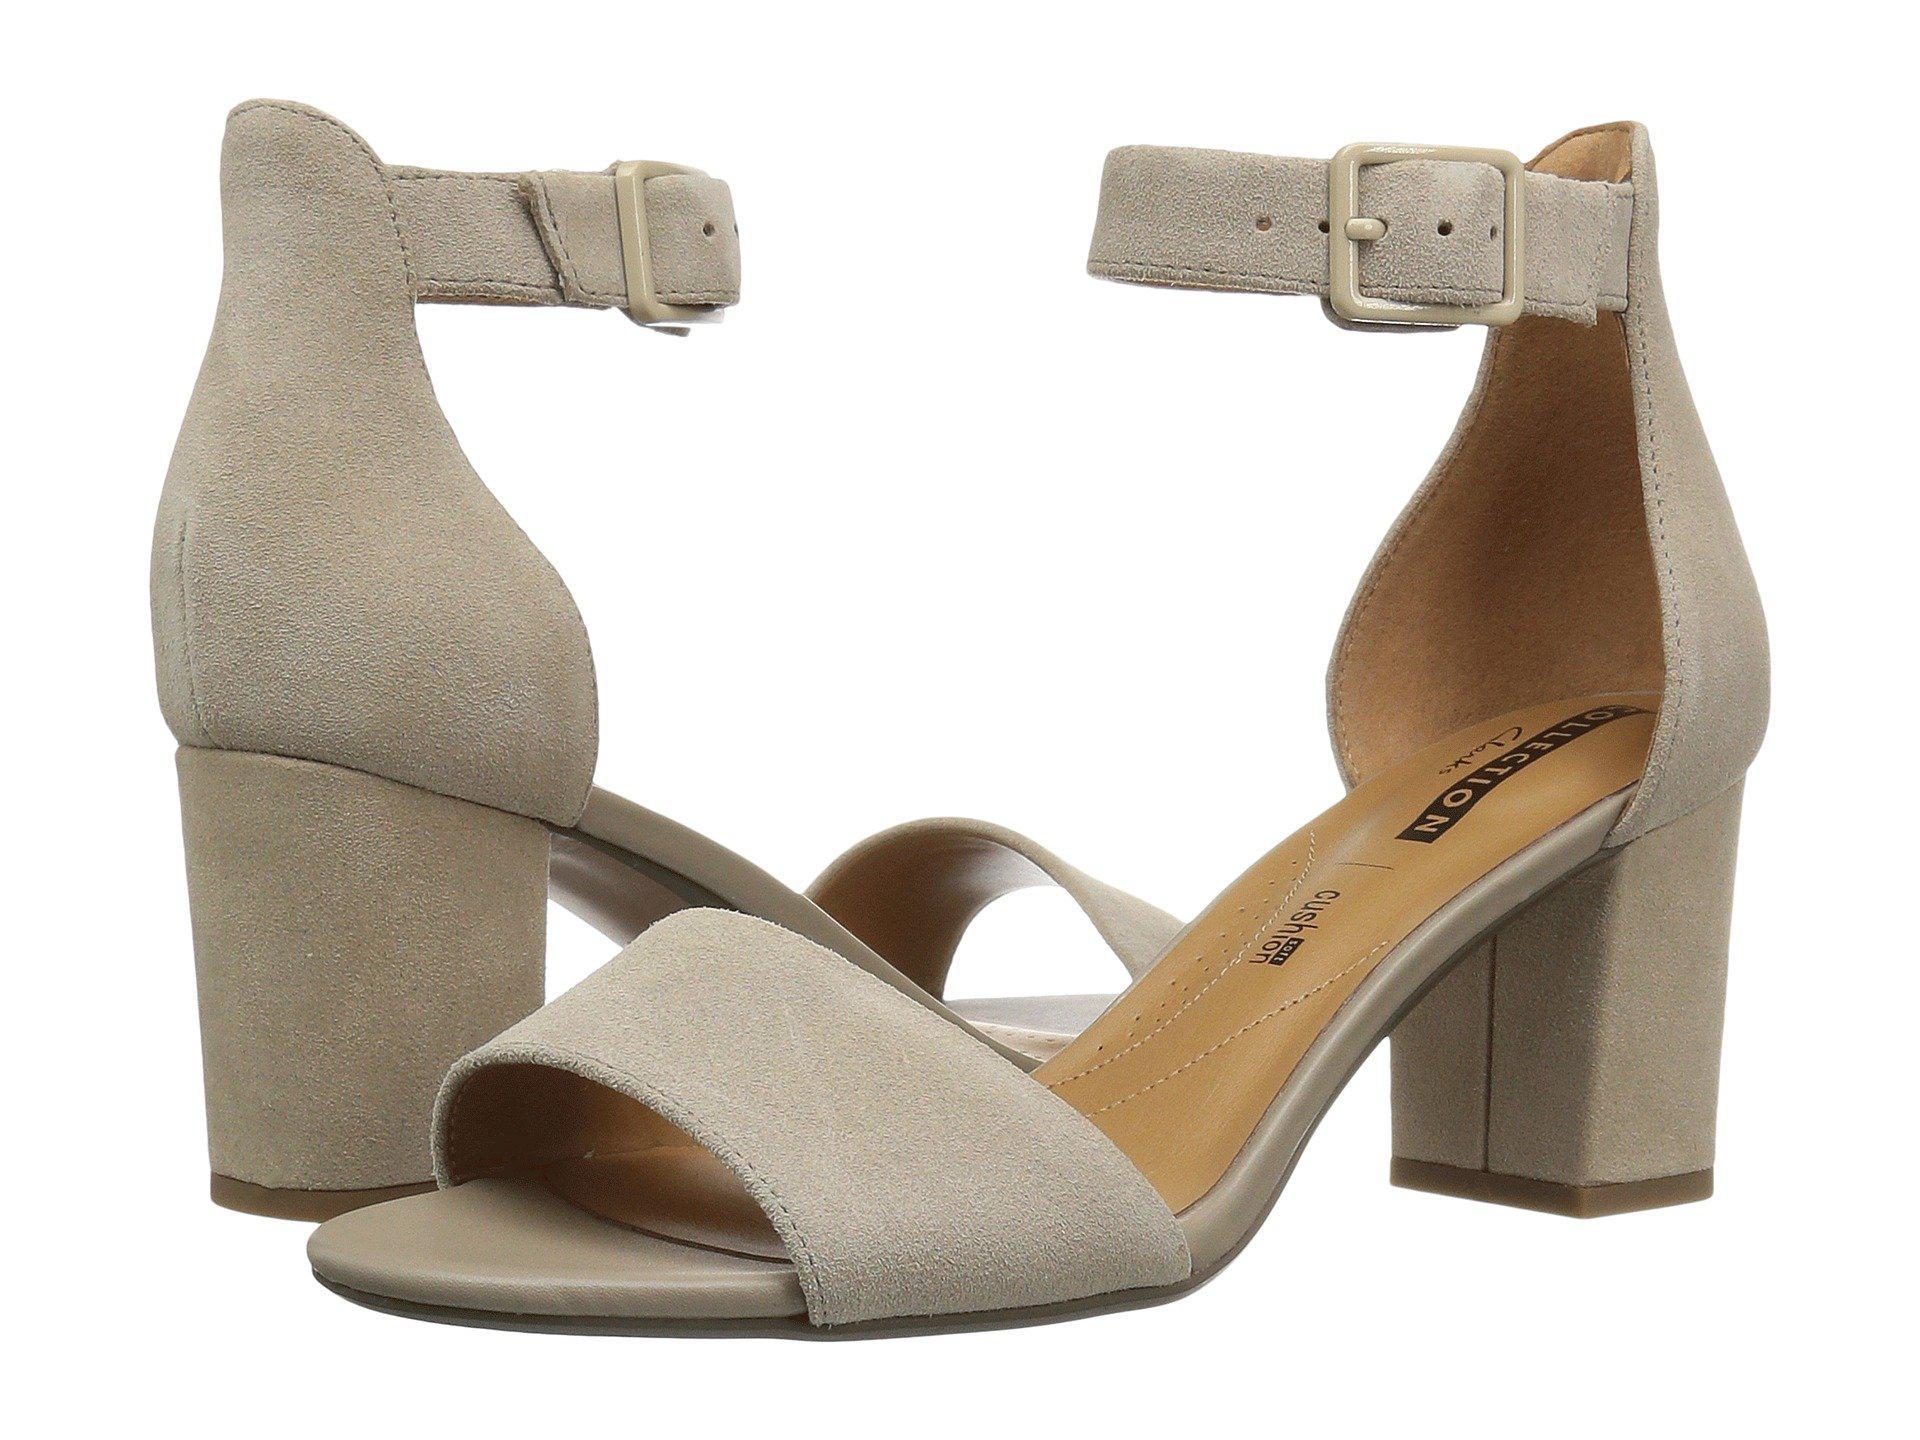 90f346dea8f8 Lyst - Clarks Deva Mae Dress Sandal in Natural - Save 18%